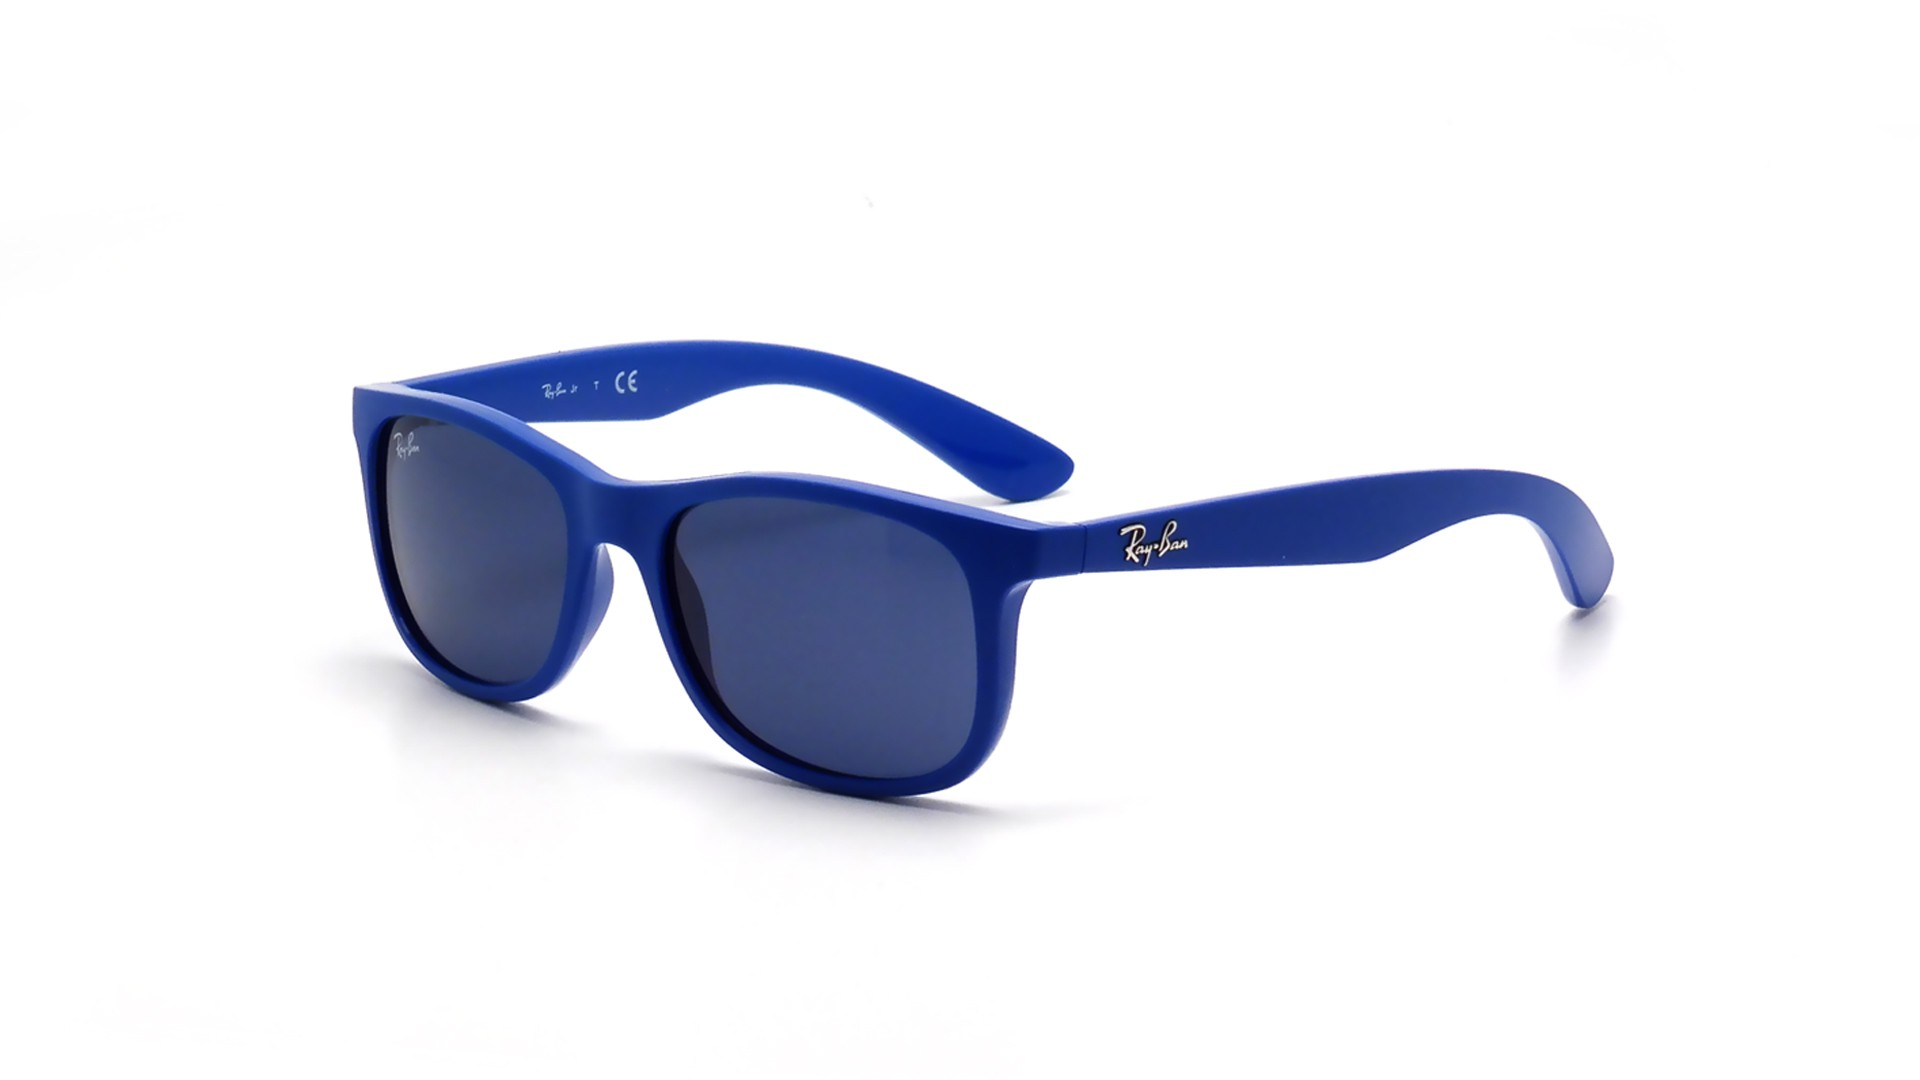 fe6cceb0940 Sunglasses Ray-Ban RJ9062S 701780 48-16 Blue Junior